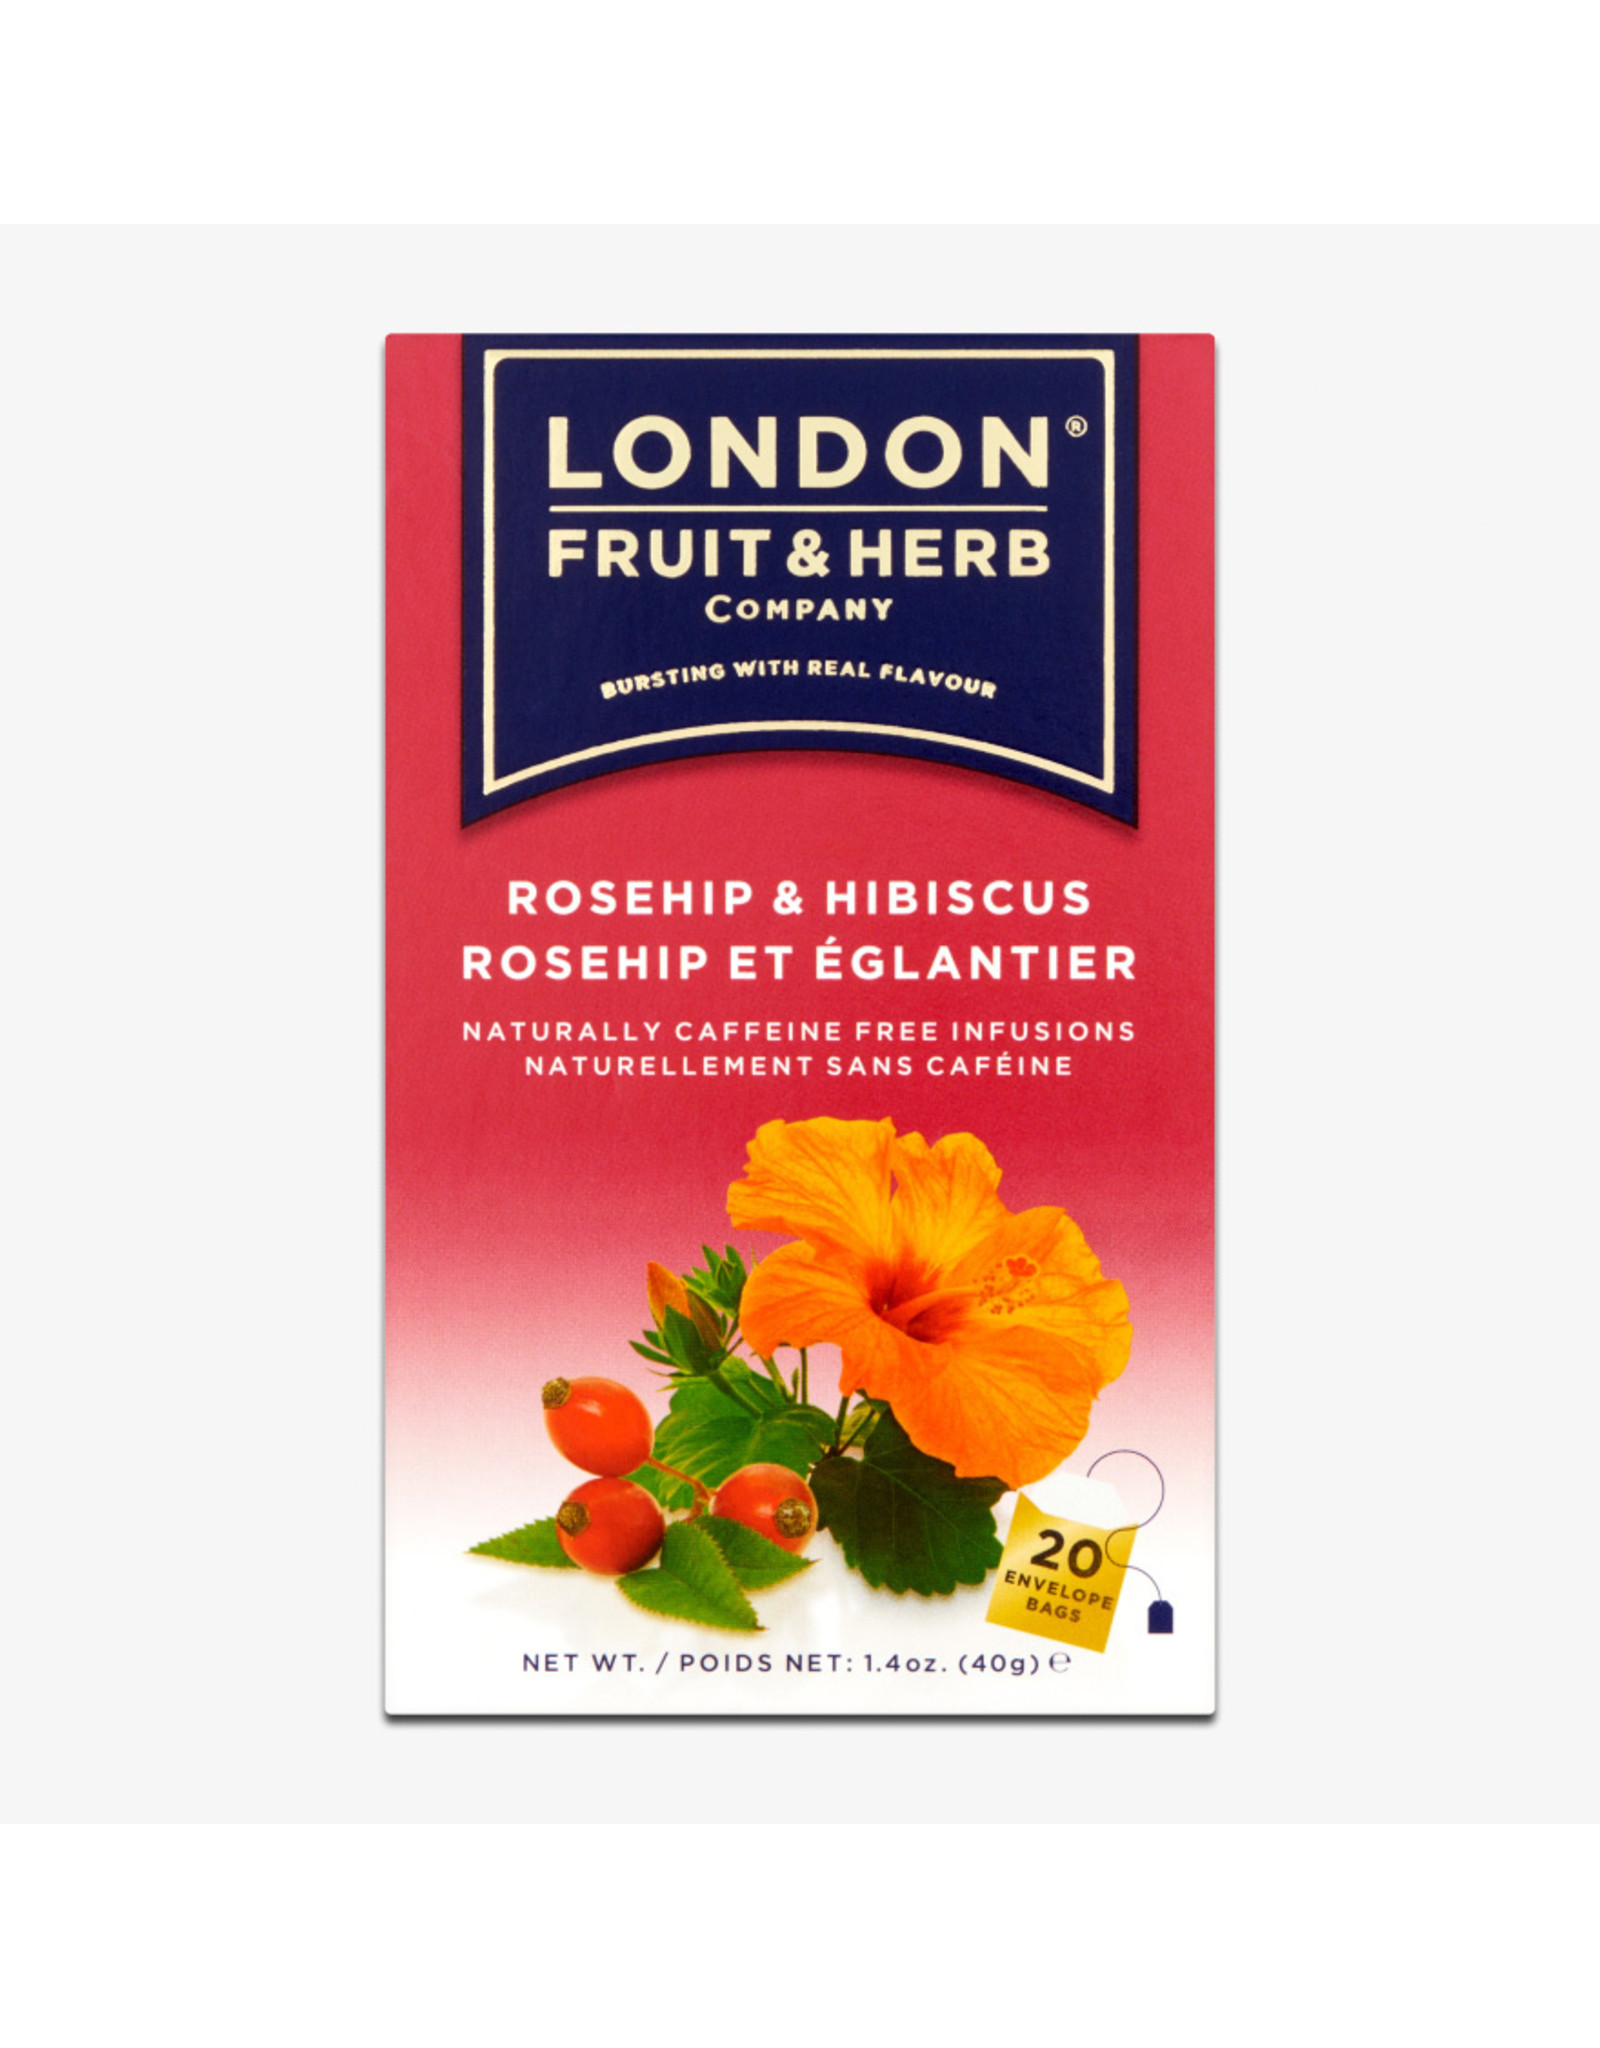 London Fruit & Herb Rosehip & Hibiscus